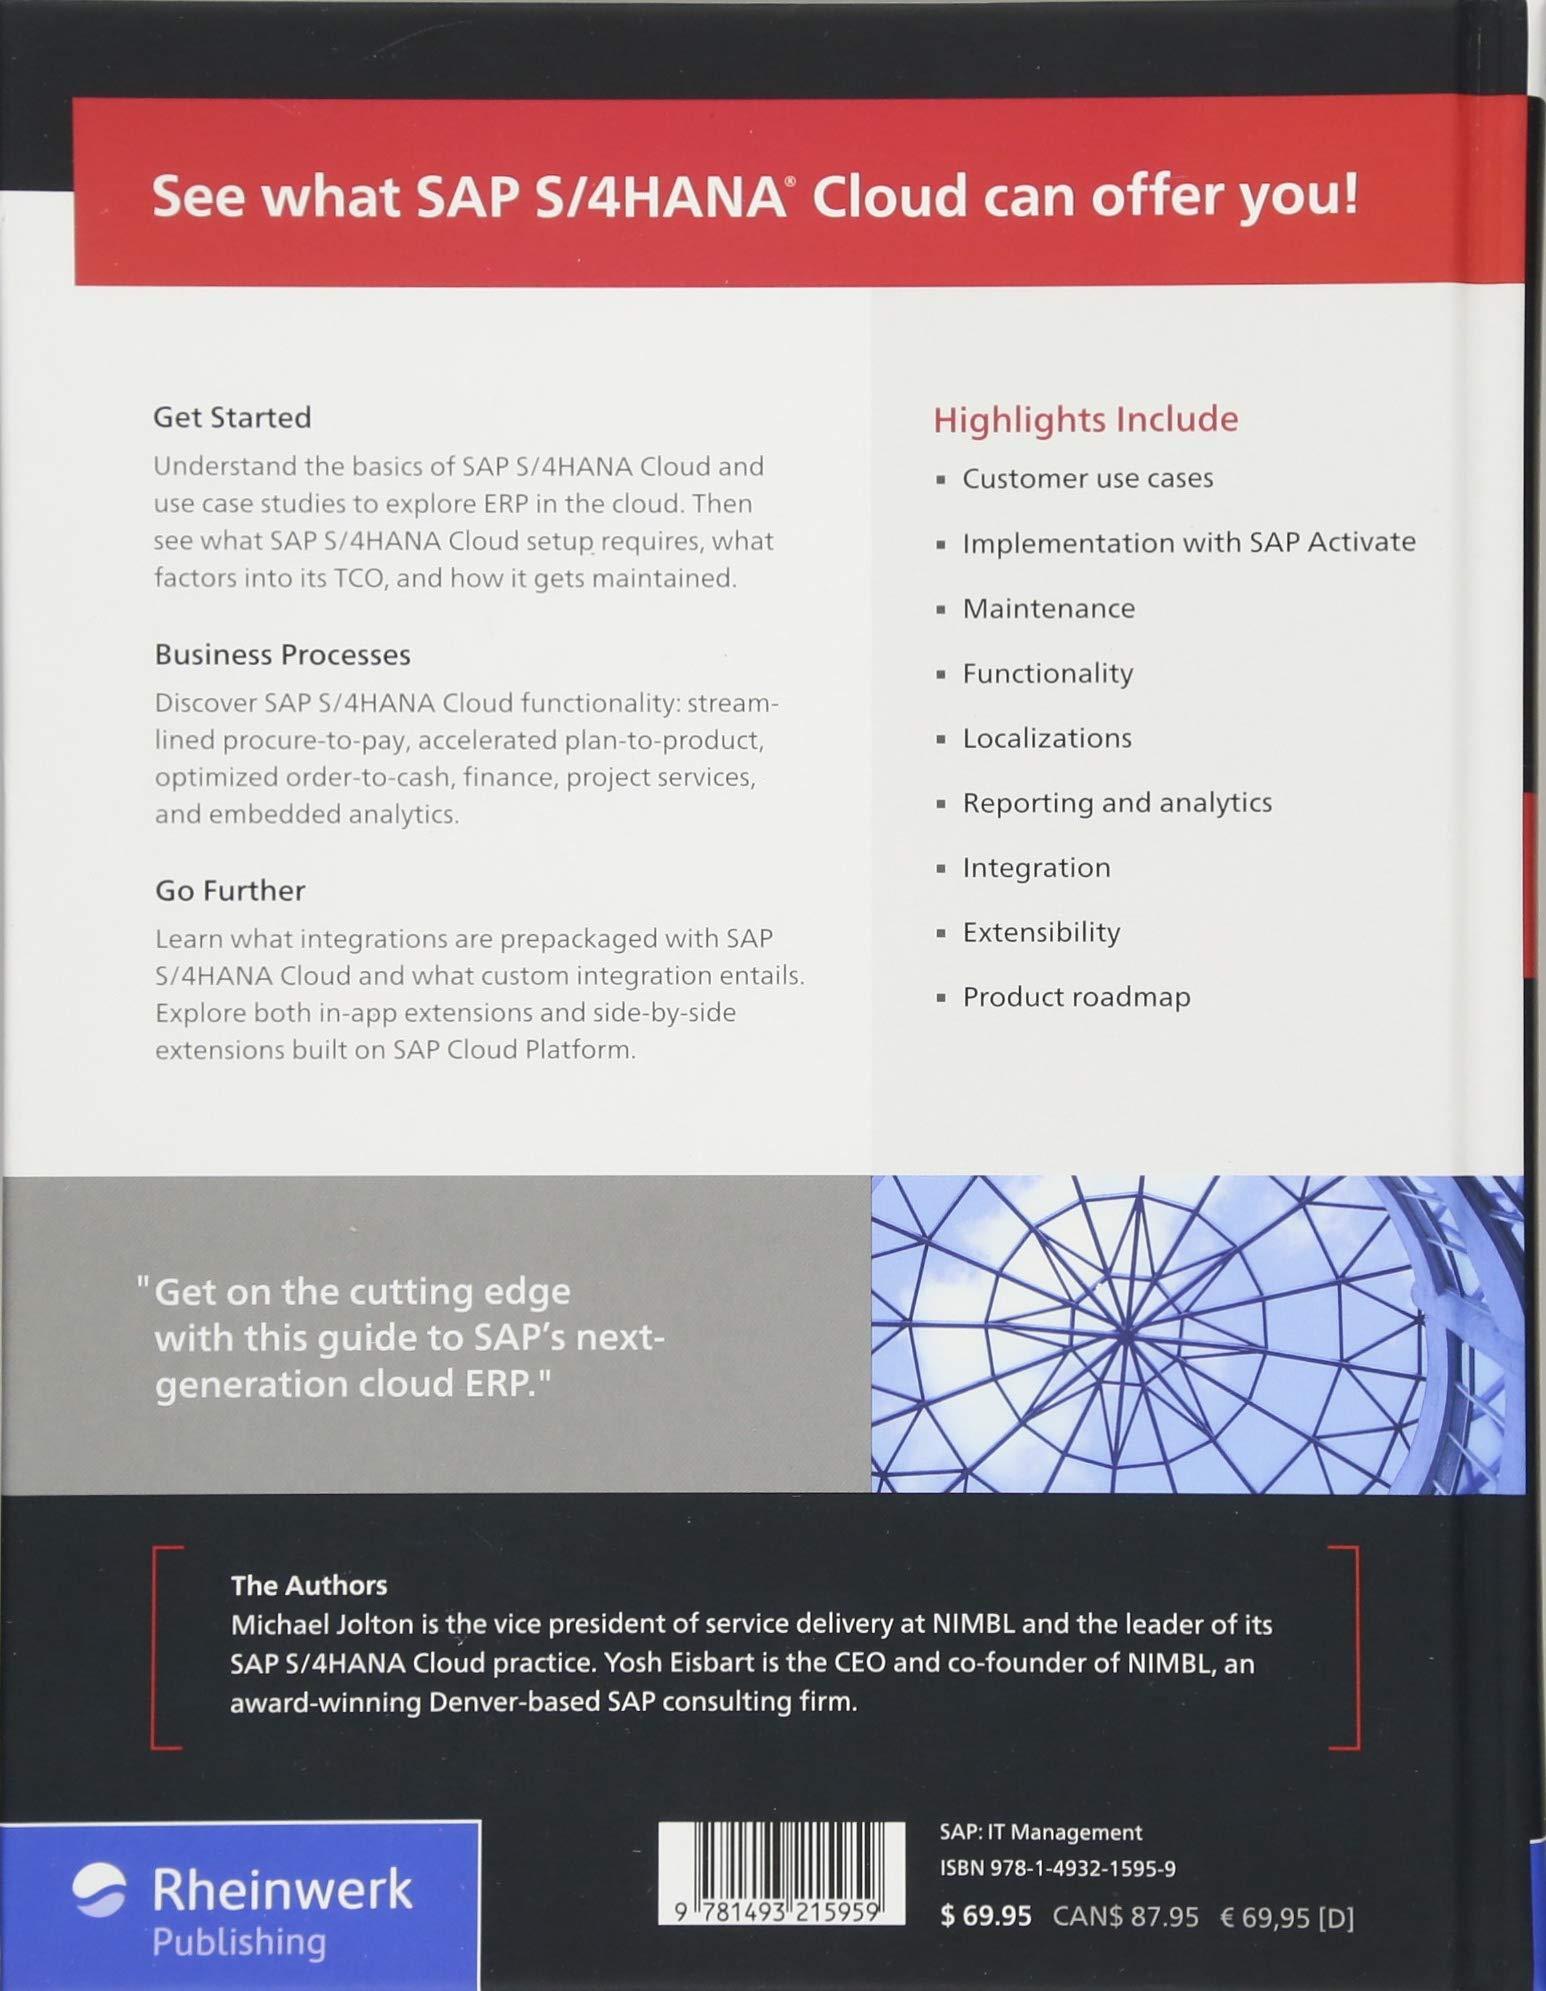 Amazon com: SAP S/4HANA Cloud: Use Cases, Functionality, and